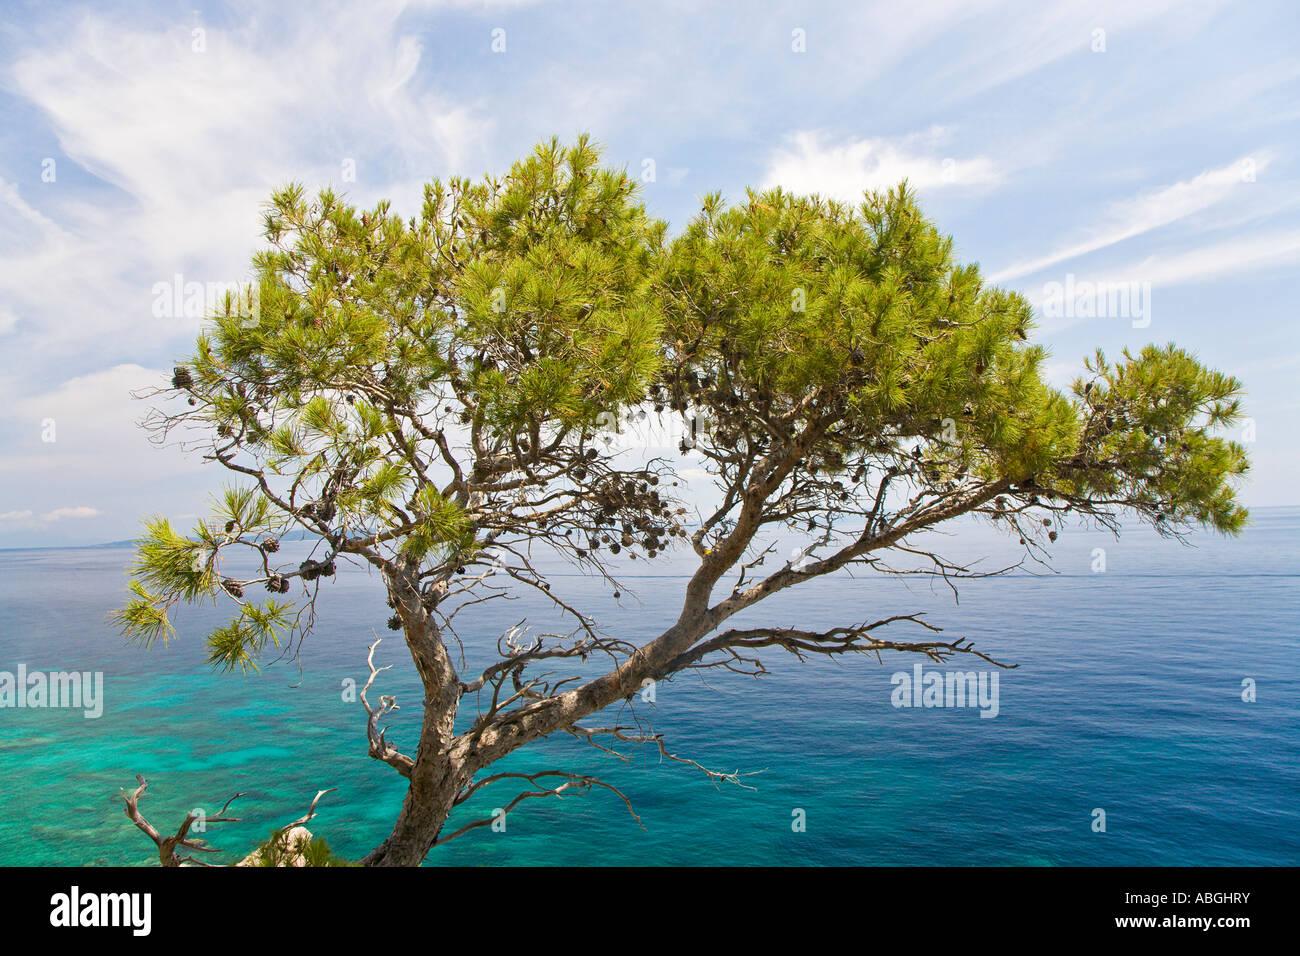 Aleppo pine (Pinus halepensis), in front of turquoise-blue sea, Island Hvar, Dalmatia, Croatia - Stock Image